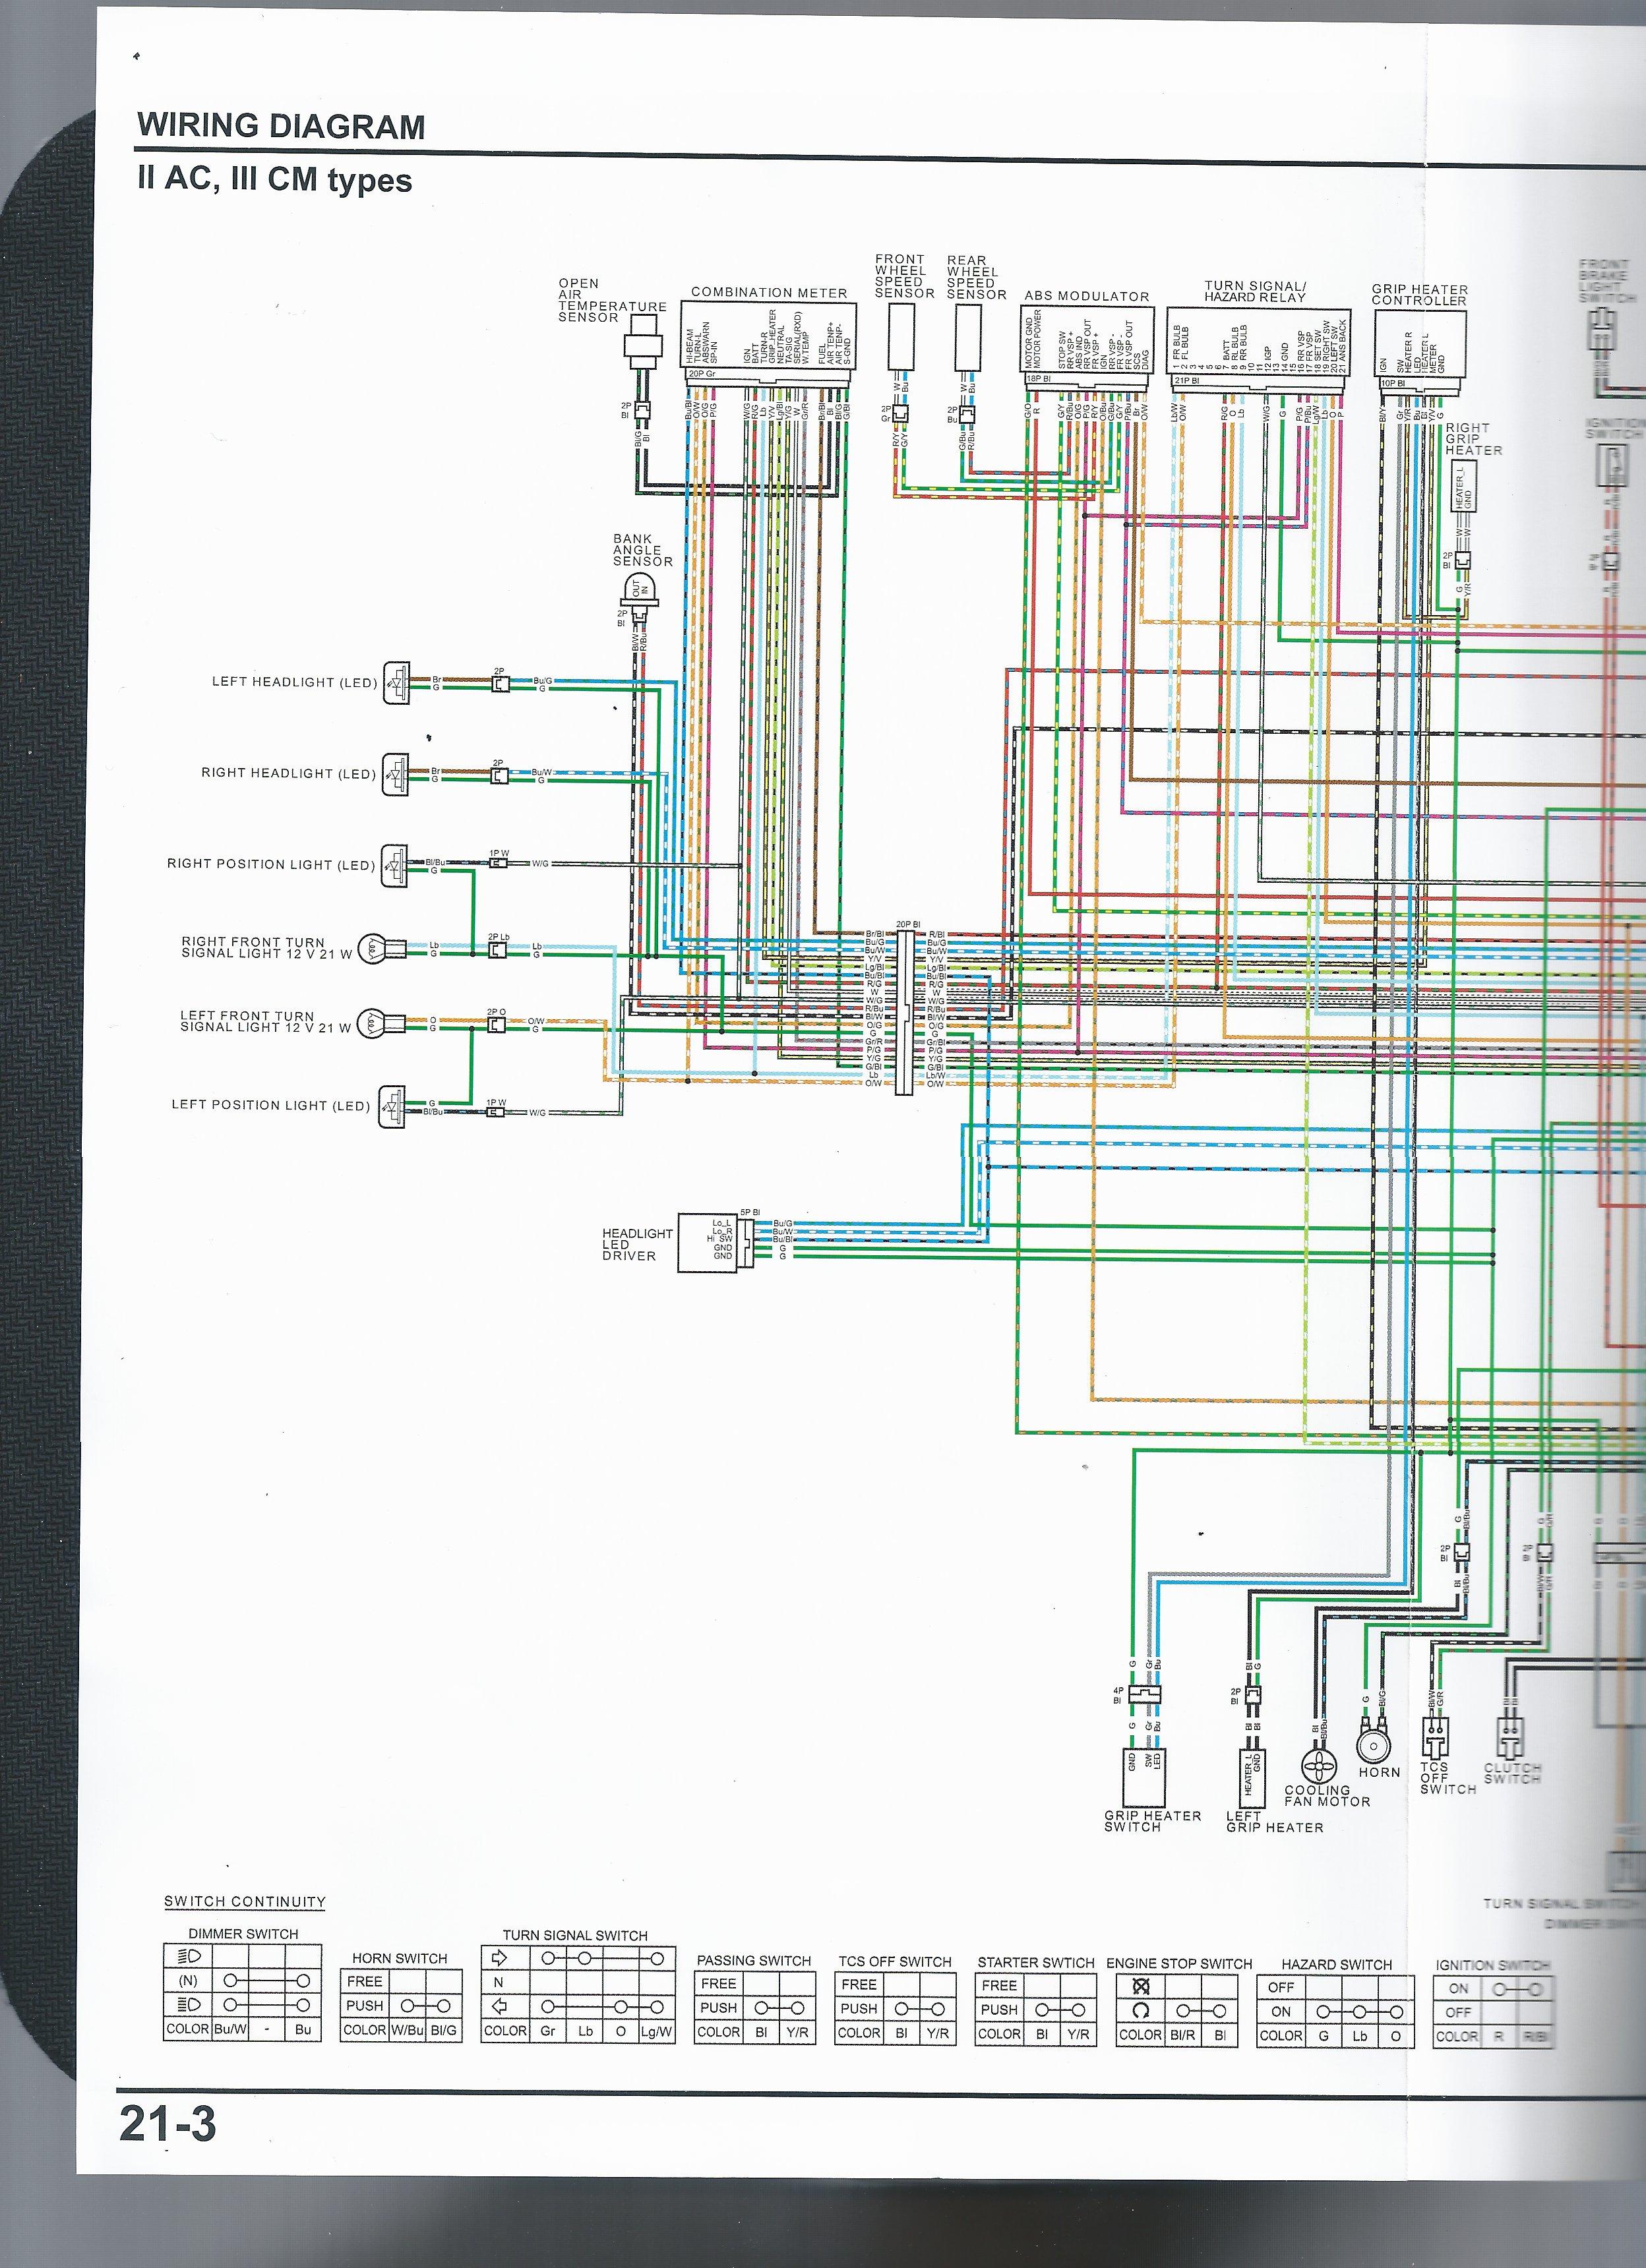 Wiring Diagram Honda Vfr 400 - Wiring Diagram Show on